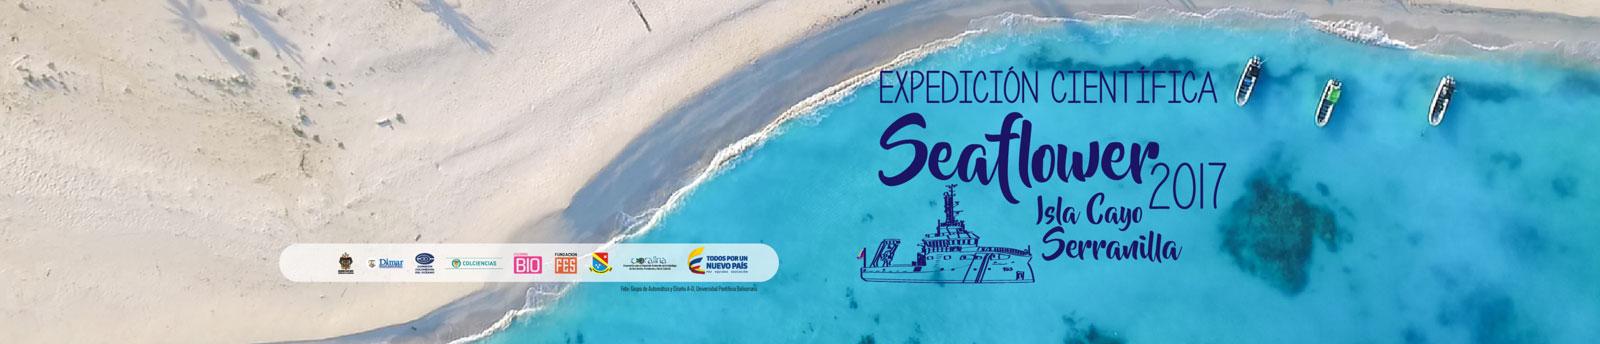 Expedición Científica Seaflower 2017